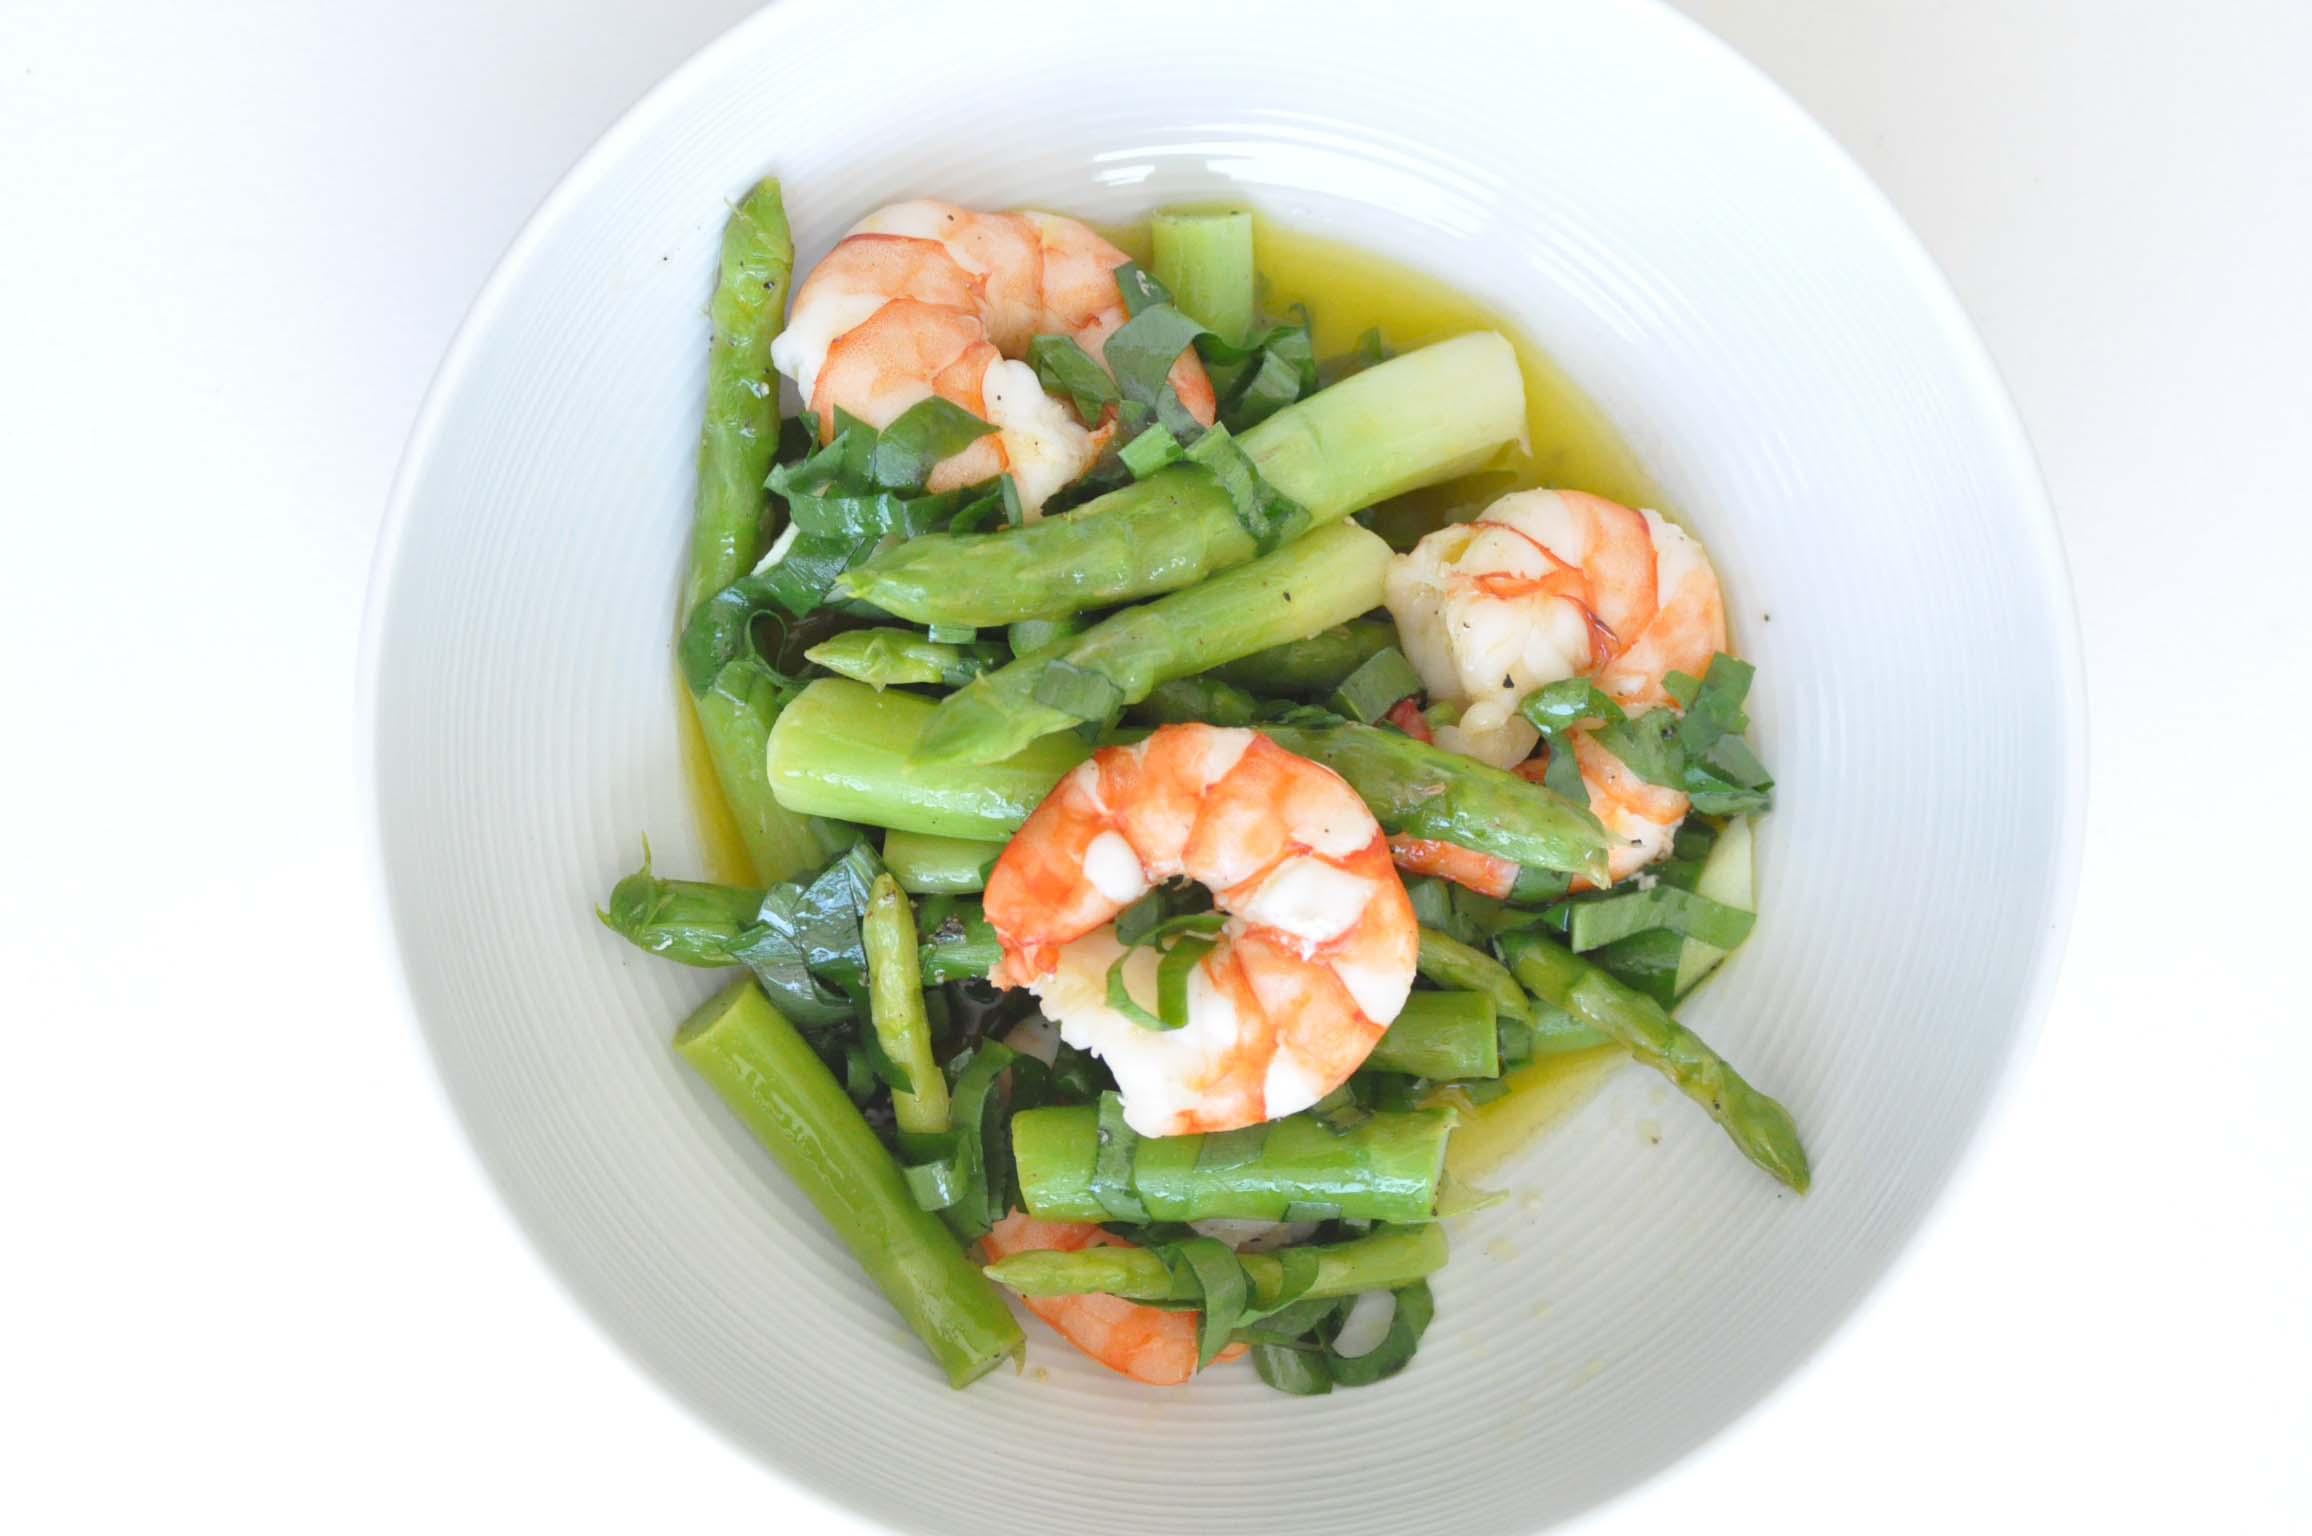 asparagus meets bears garlic_bearbeitet-1